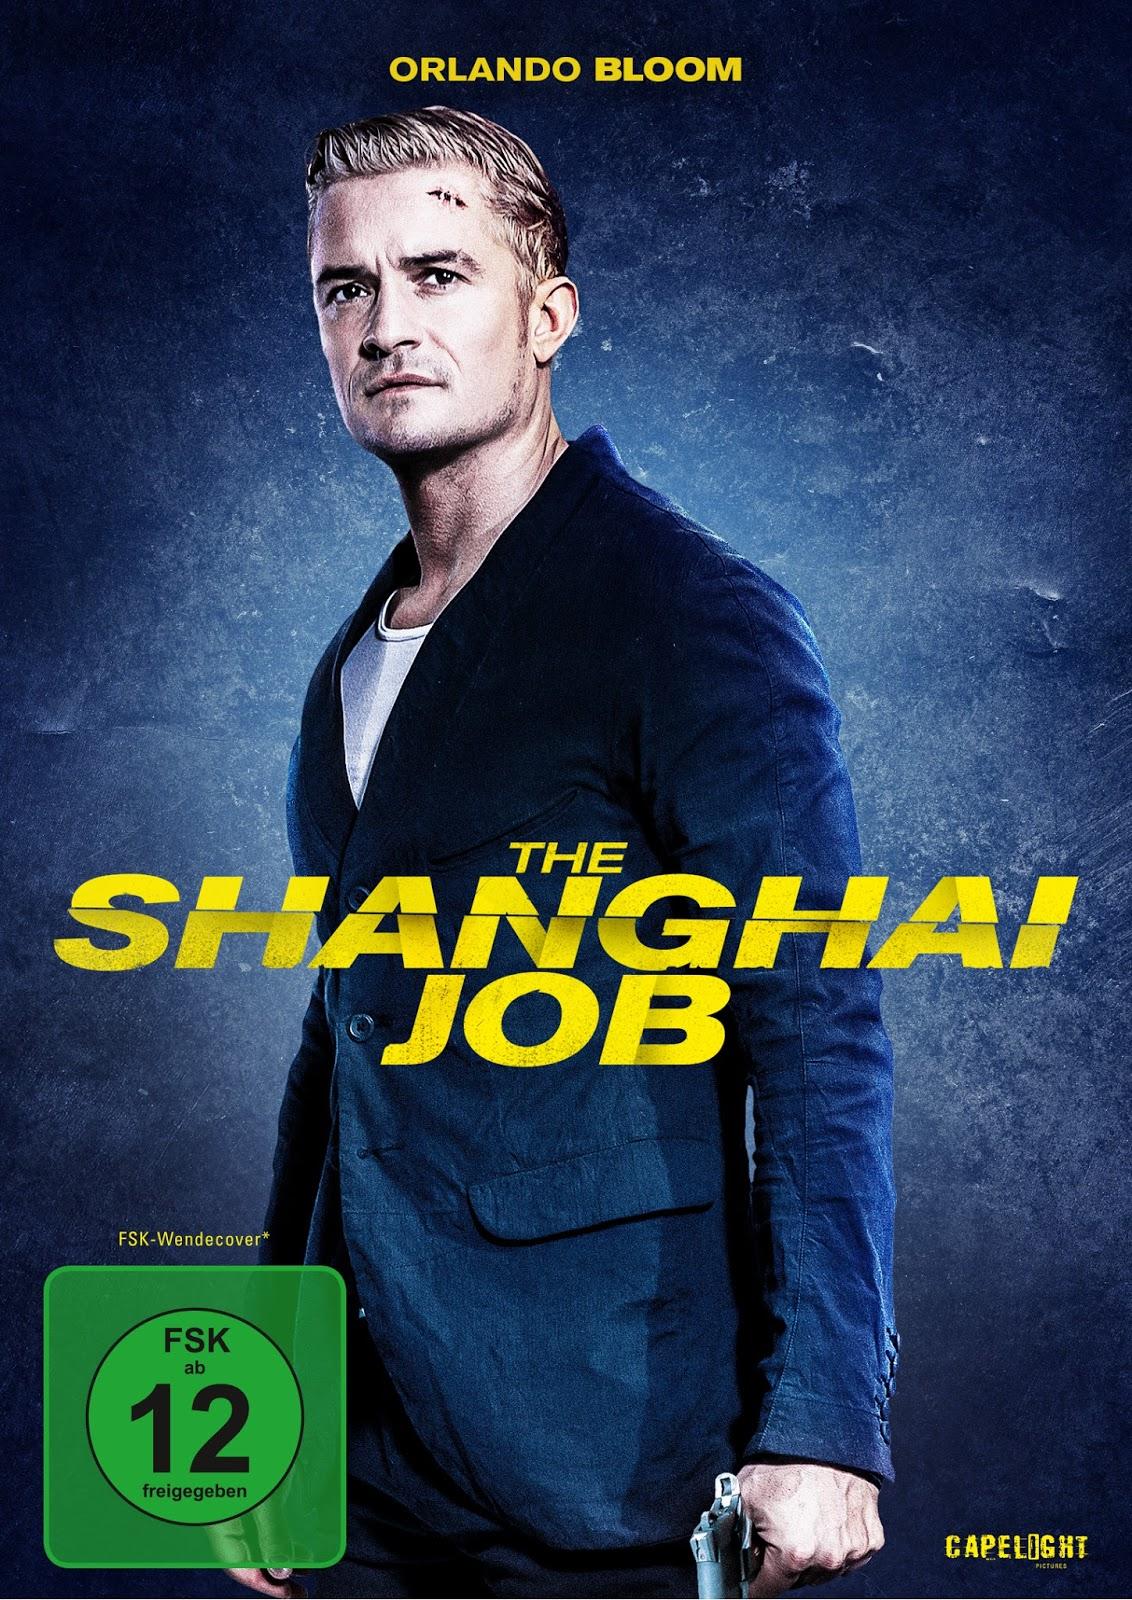 The Shanghai Job (Filmkritik) | Die Seilerseite.